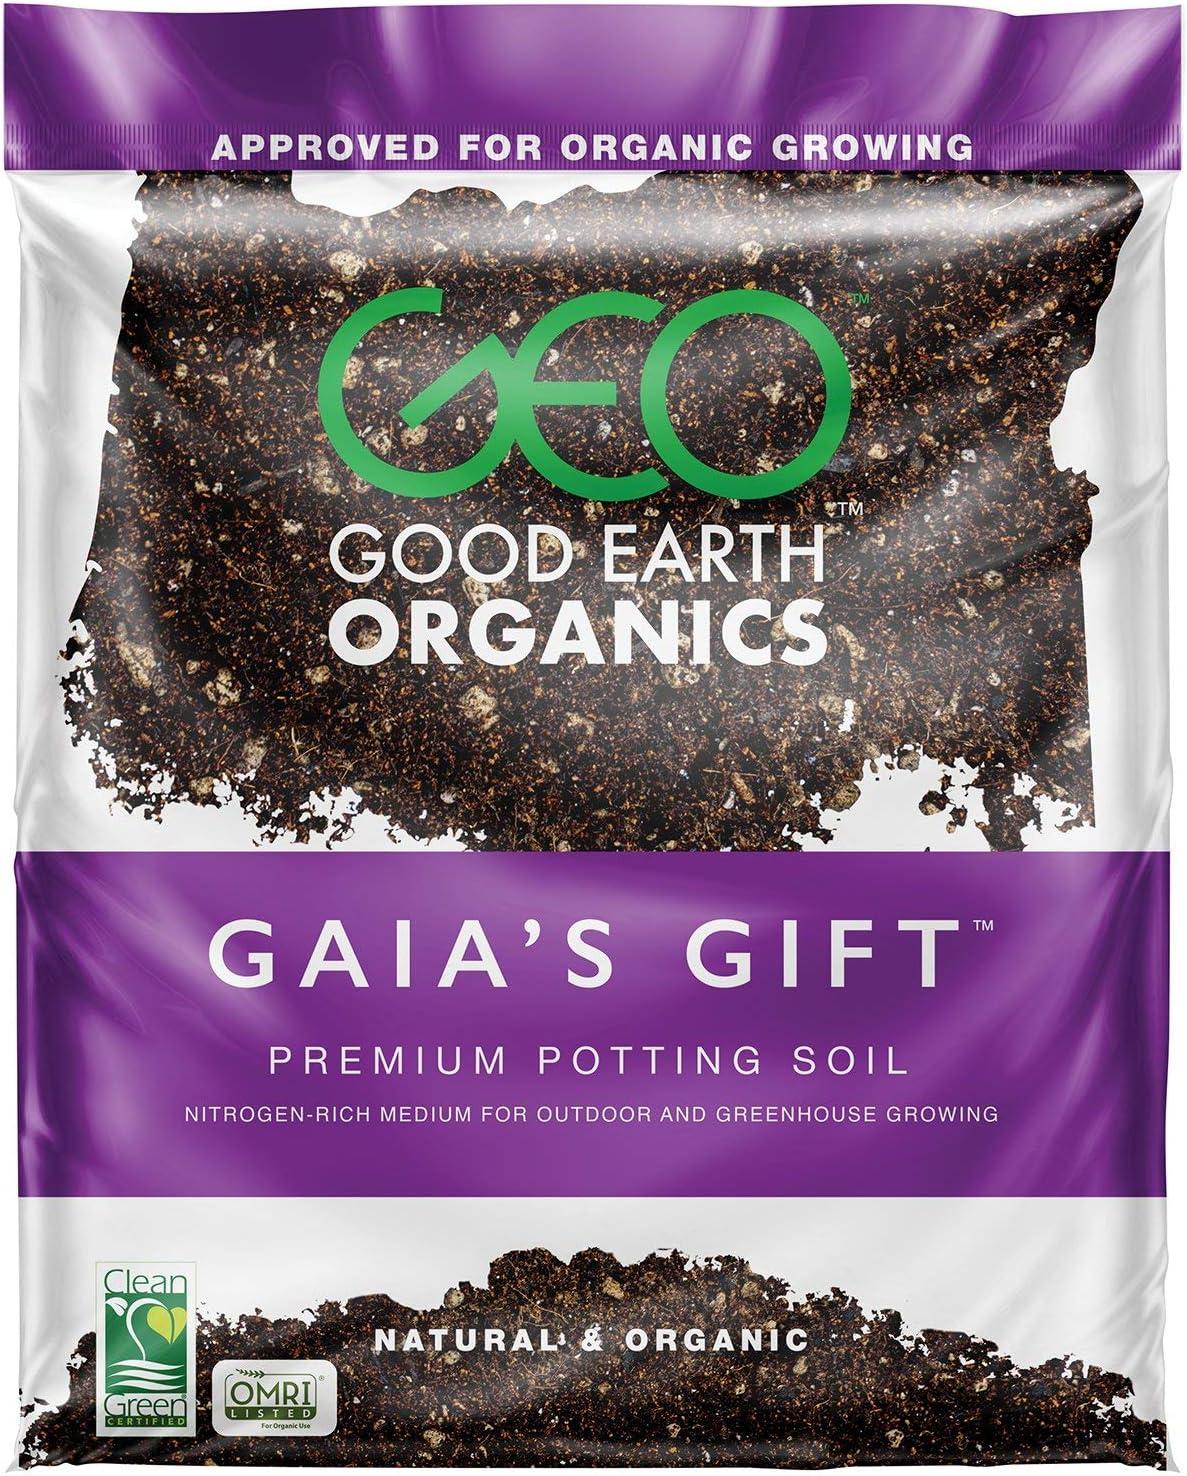 Good Earth Organics, Gaia's Gift Premium Potting Soil